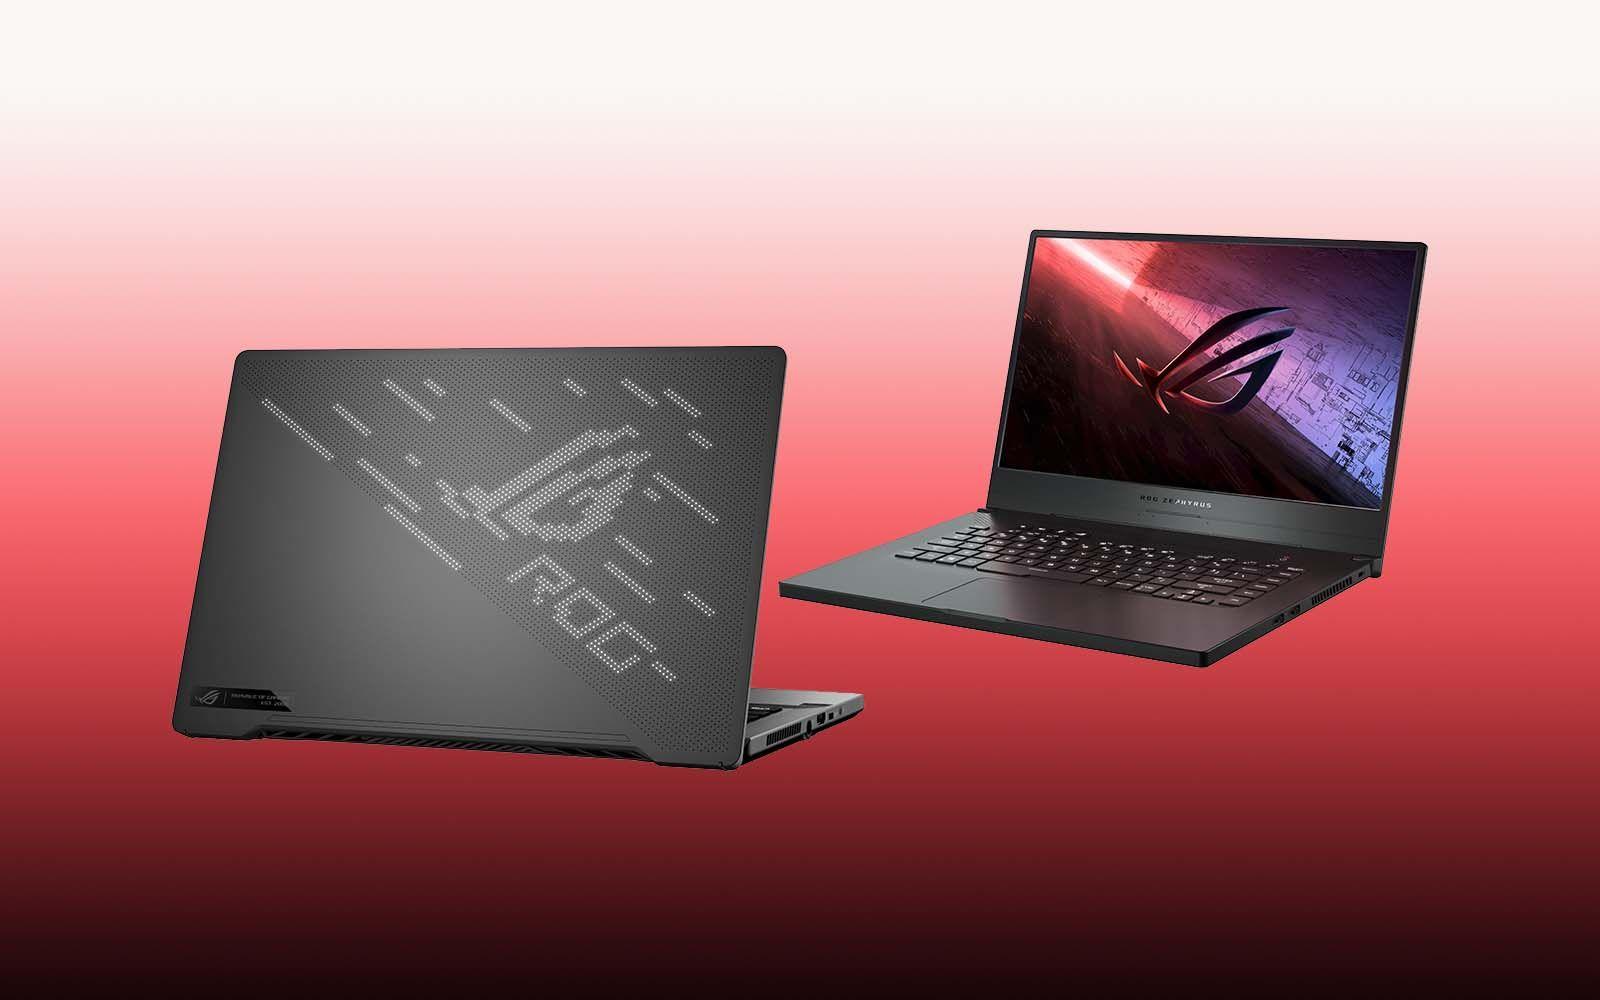 World S Best Gaming Laptop Asus Rog Zephyrus G14 Laptop In 2020 Best Gaming Laptop Laptop Gaming Laptops